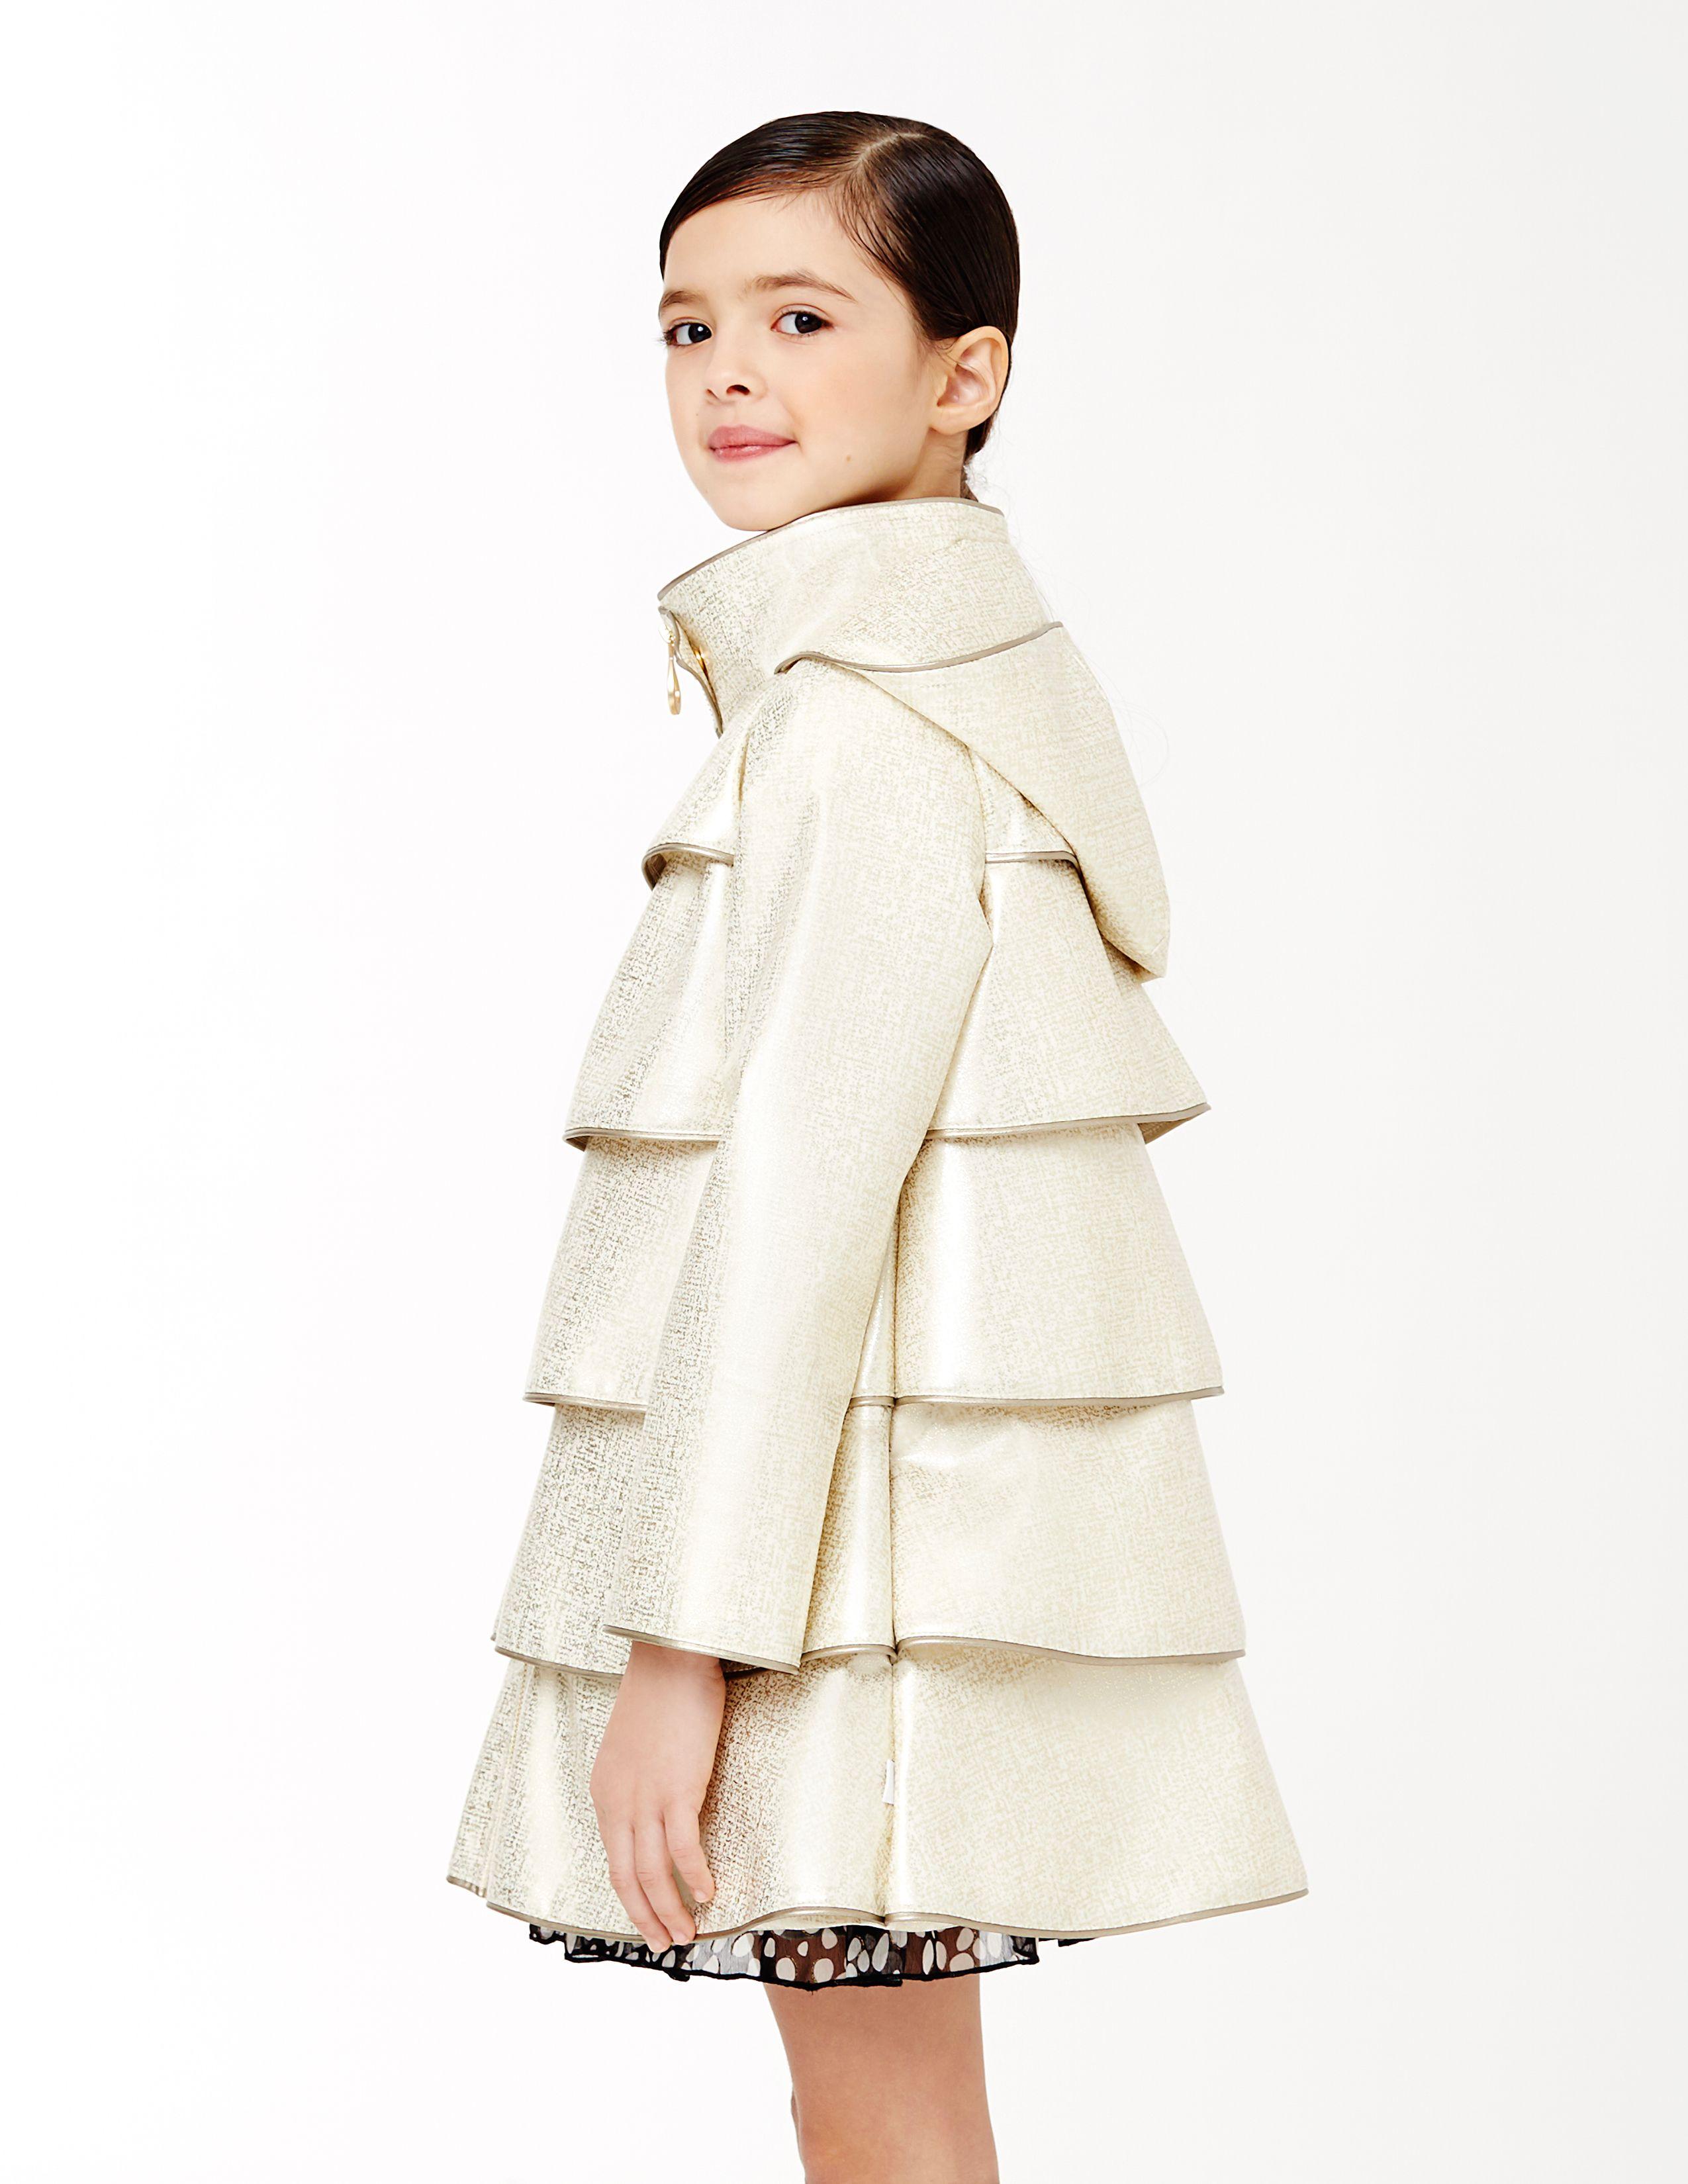 Adorable Children's fashion coming September 1! www.veux.com